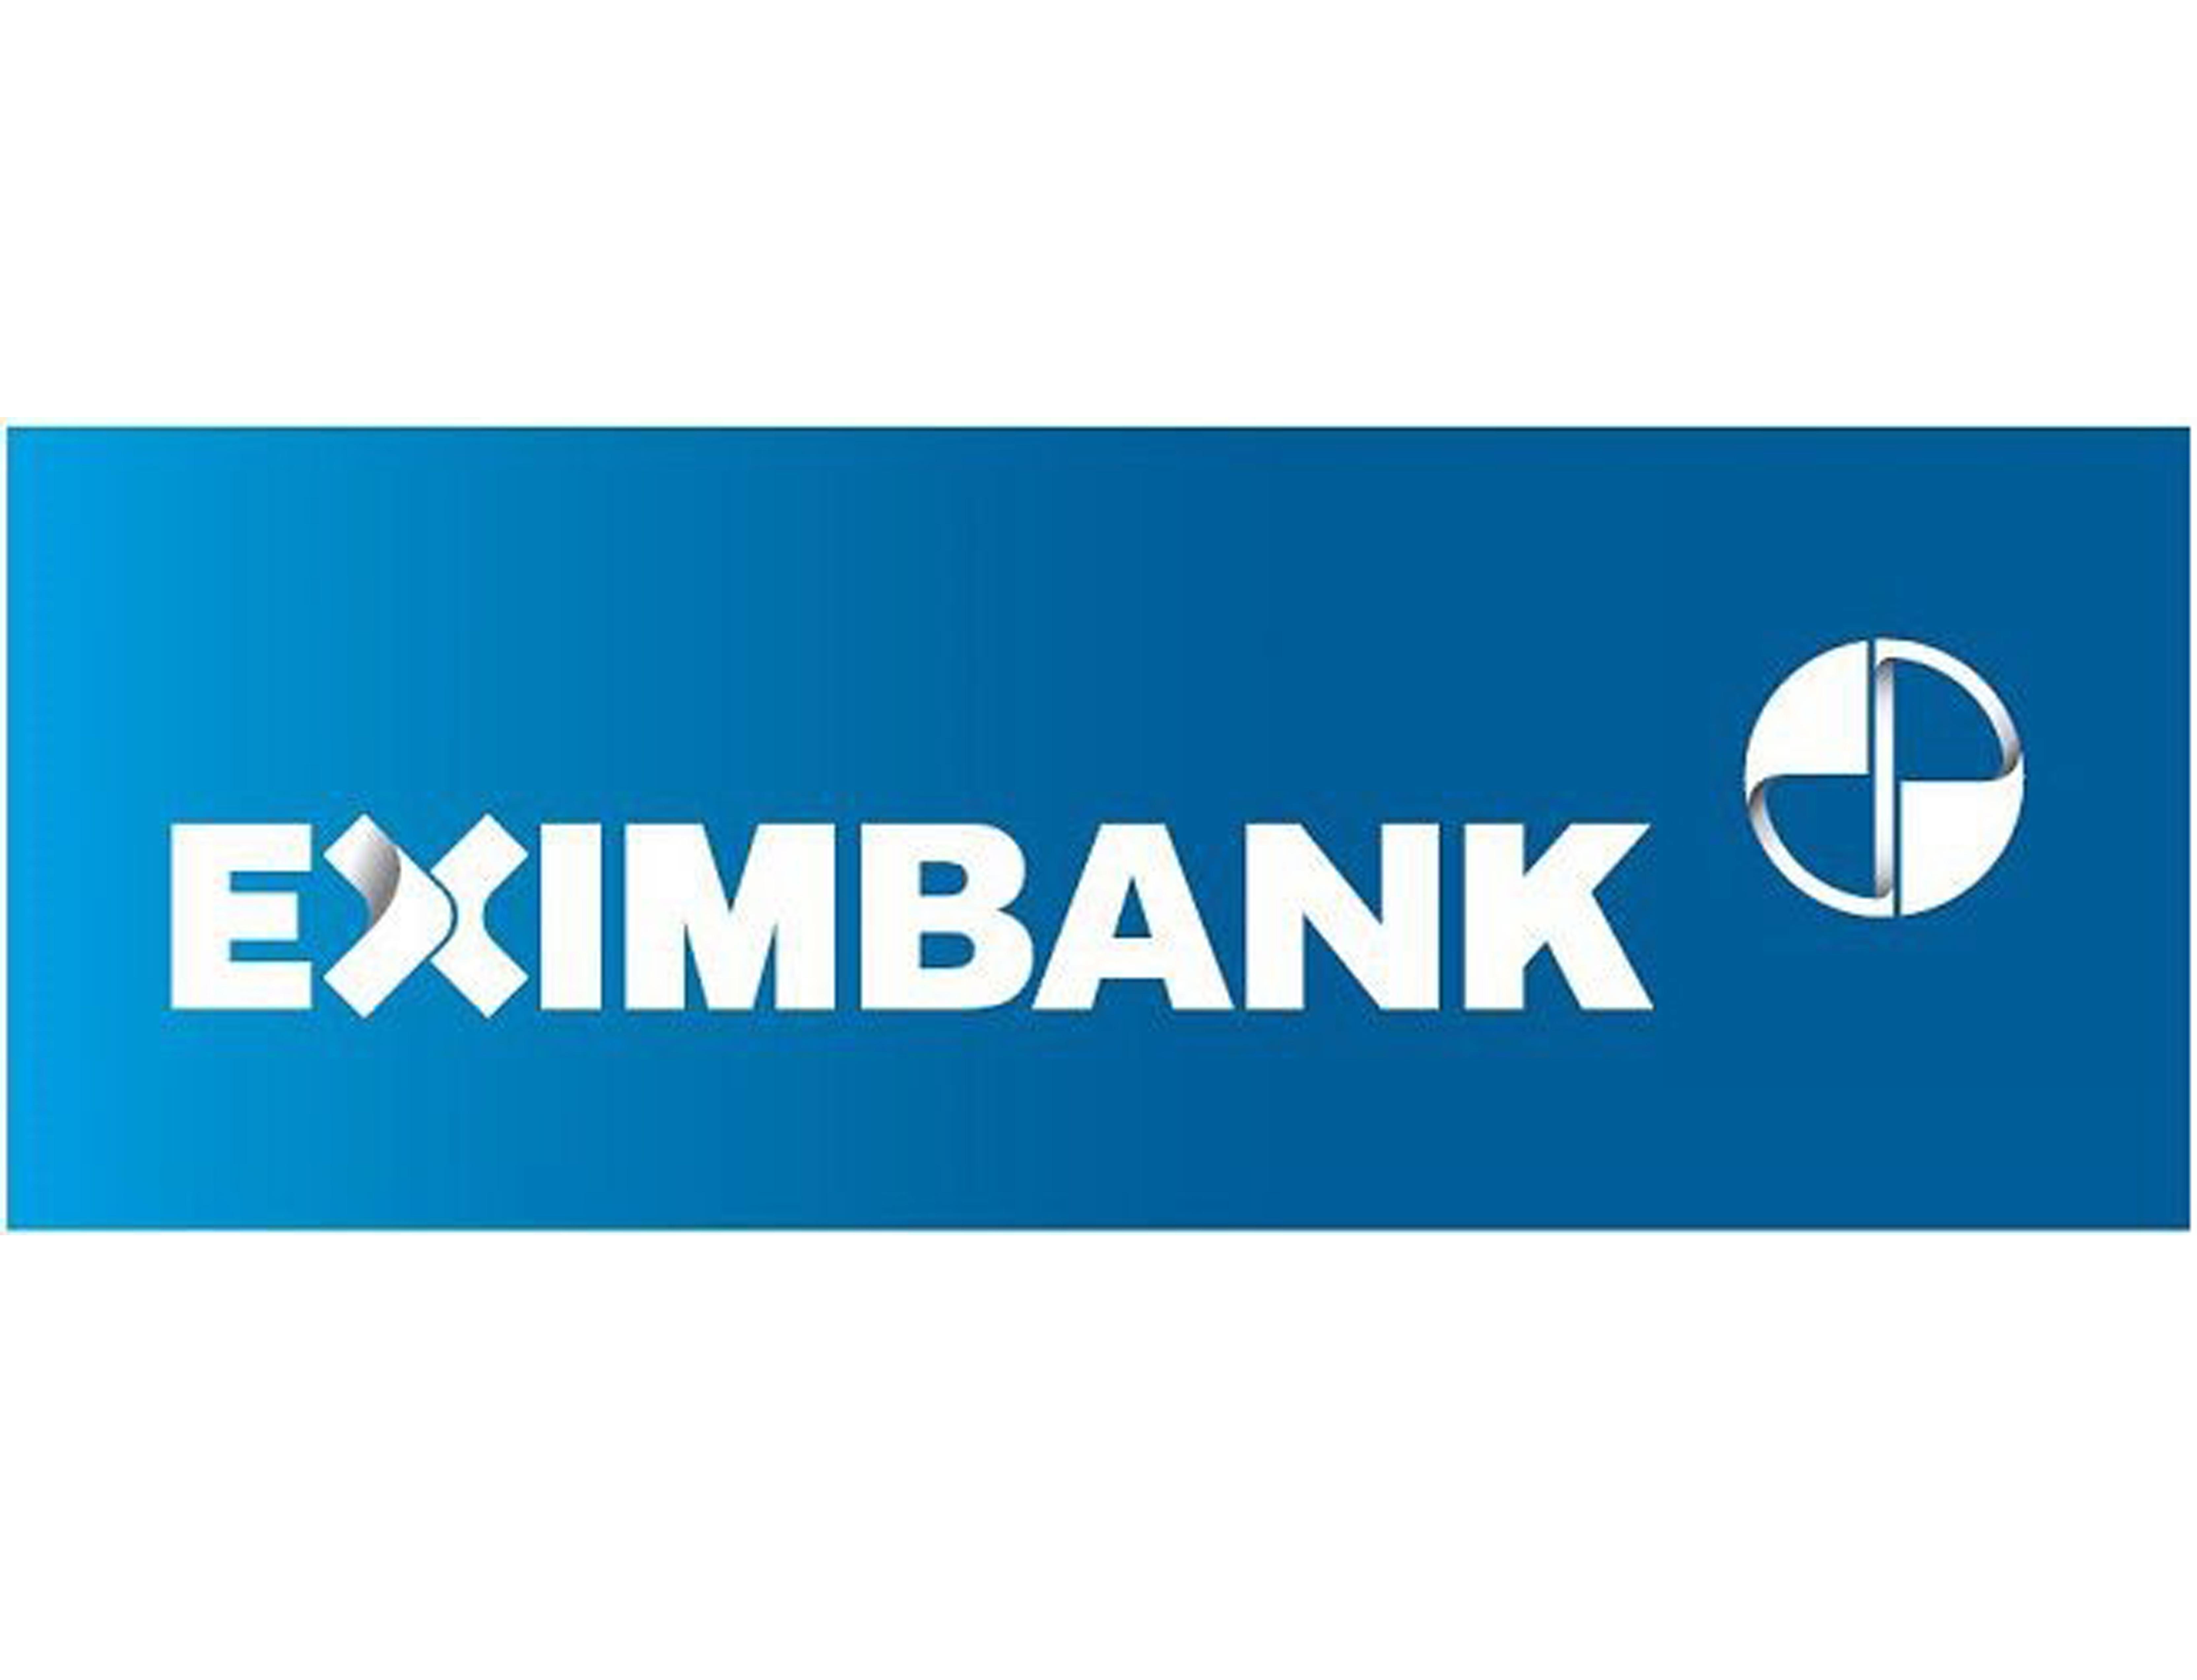 VIETNAM EXPORT IMPORT COMMERCIAL JOINT - STOCK BANK